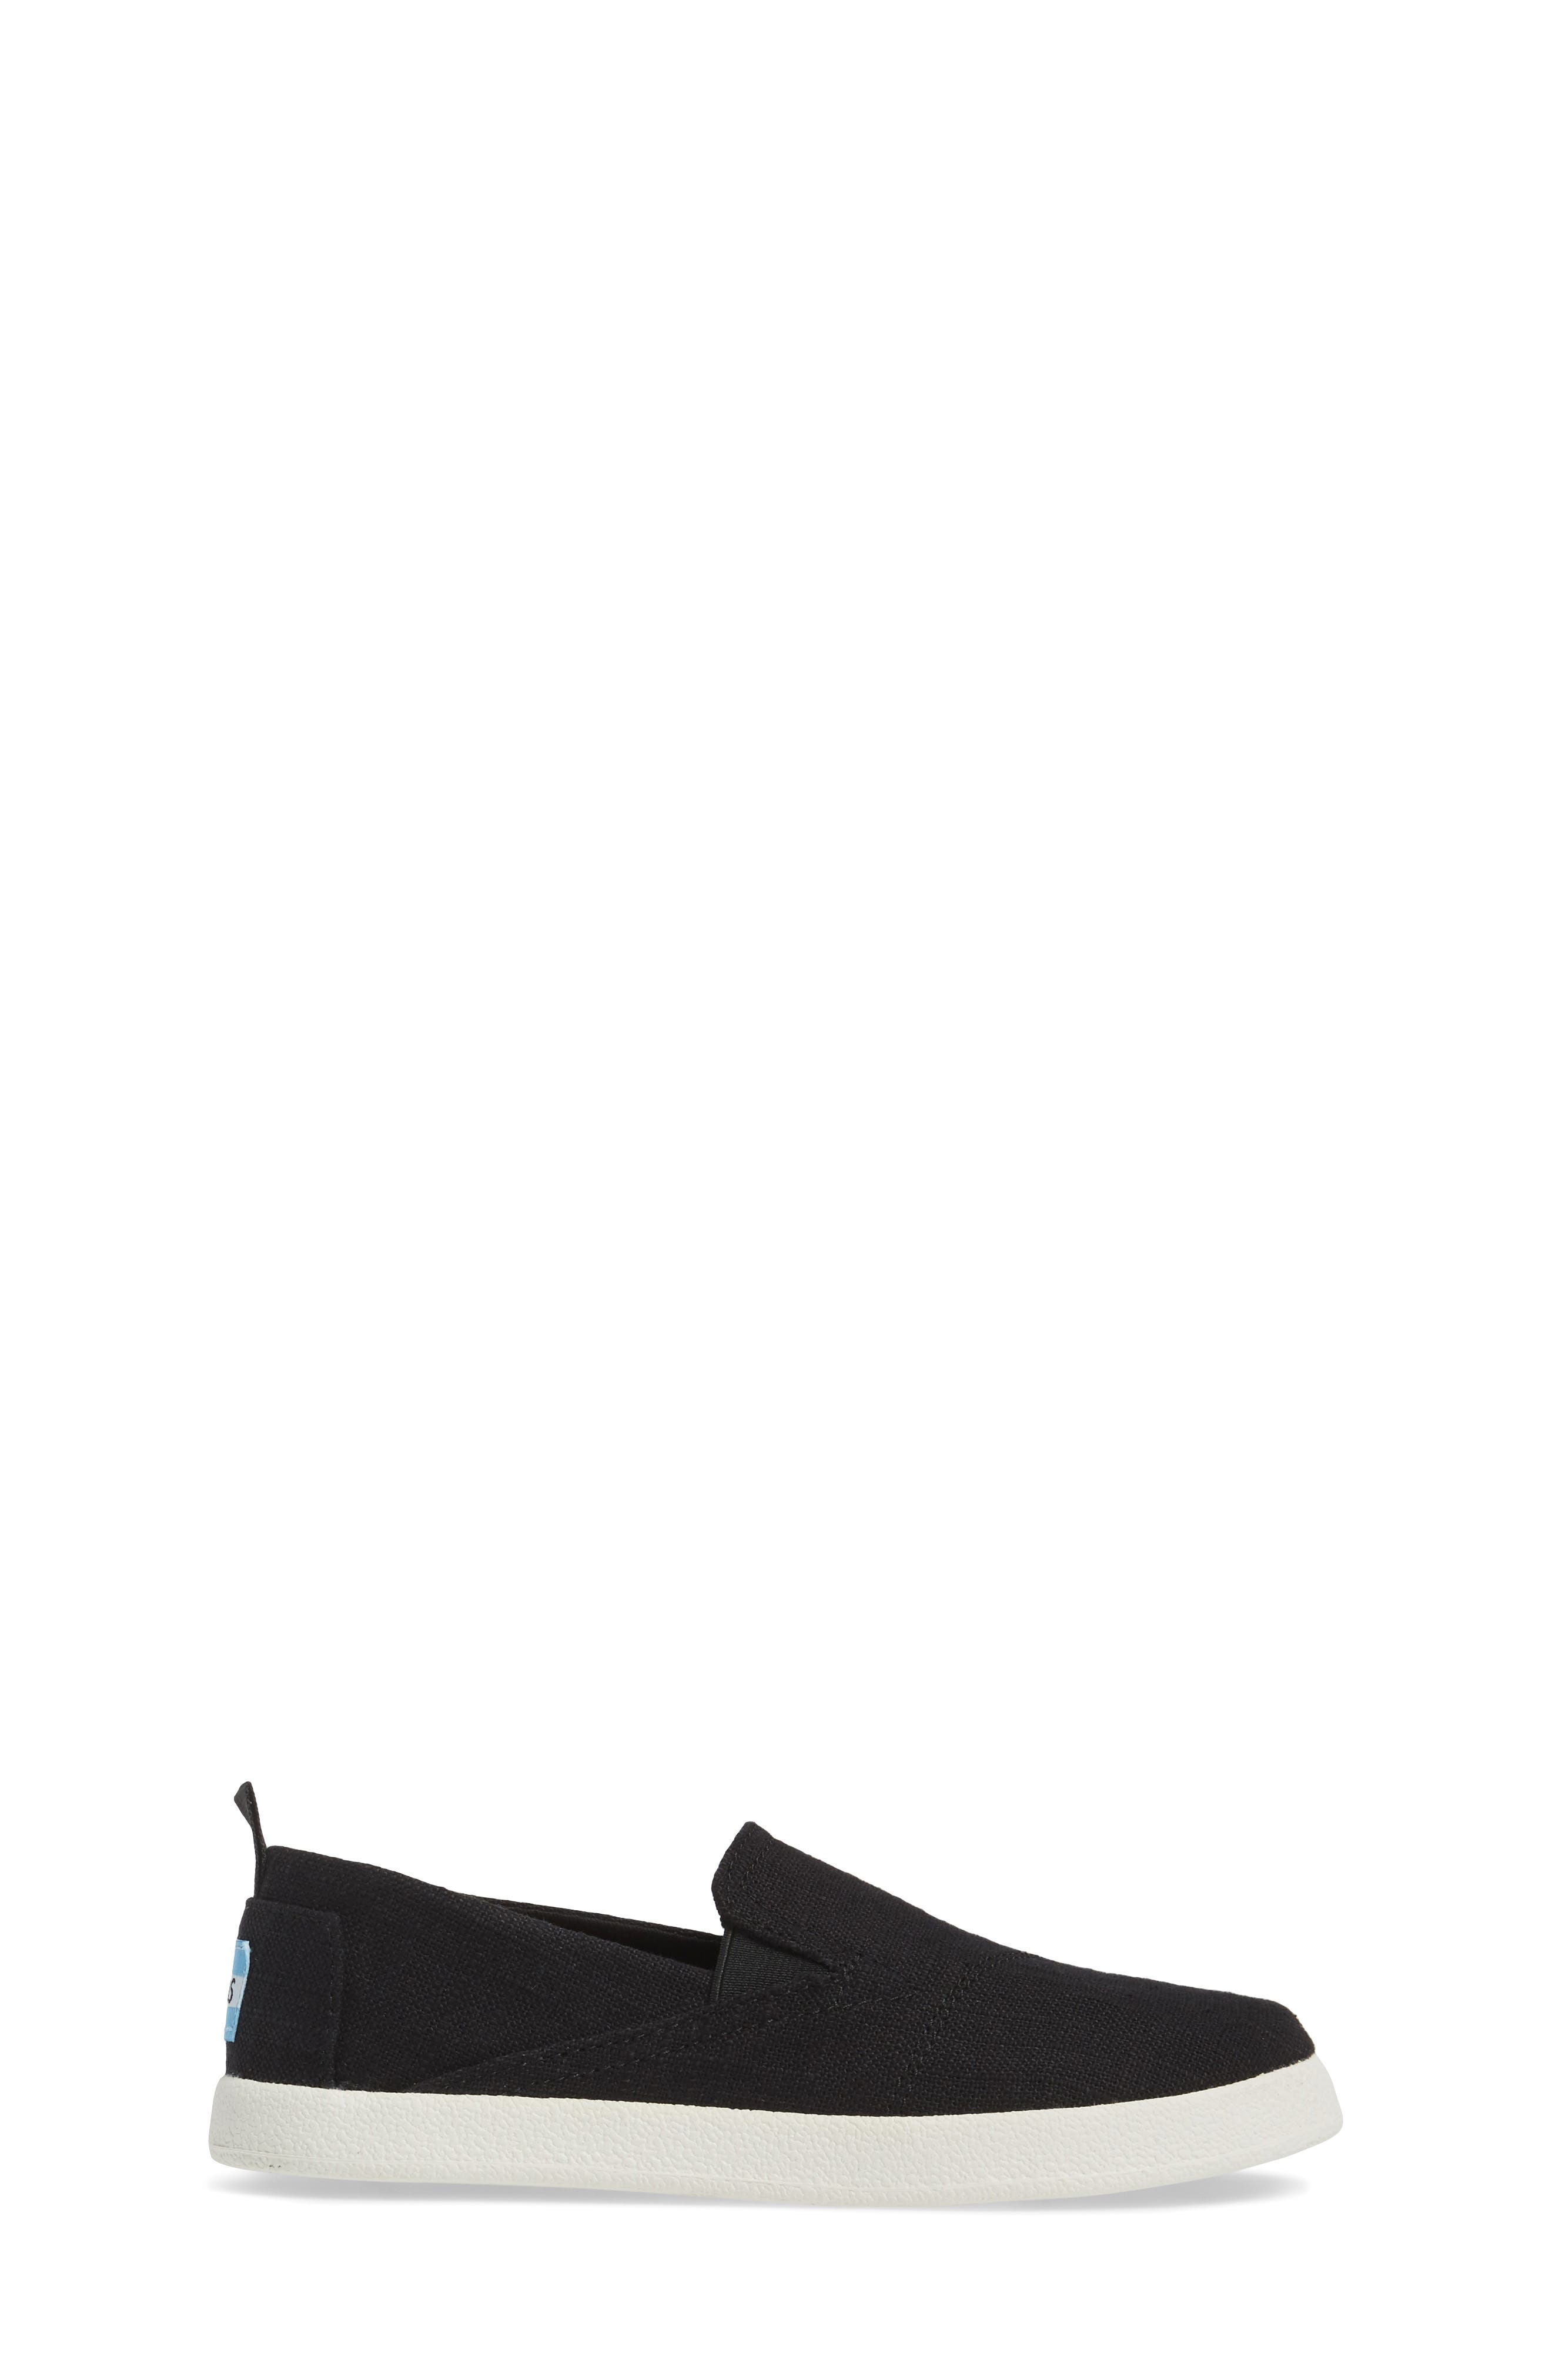 Avalon Slip-On,                             Alternate thumbnail 3, color,                             Black Washed Linen